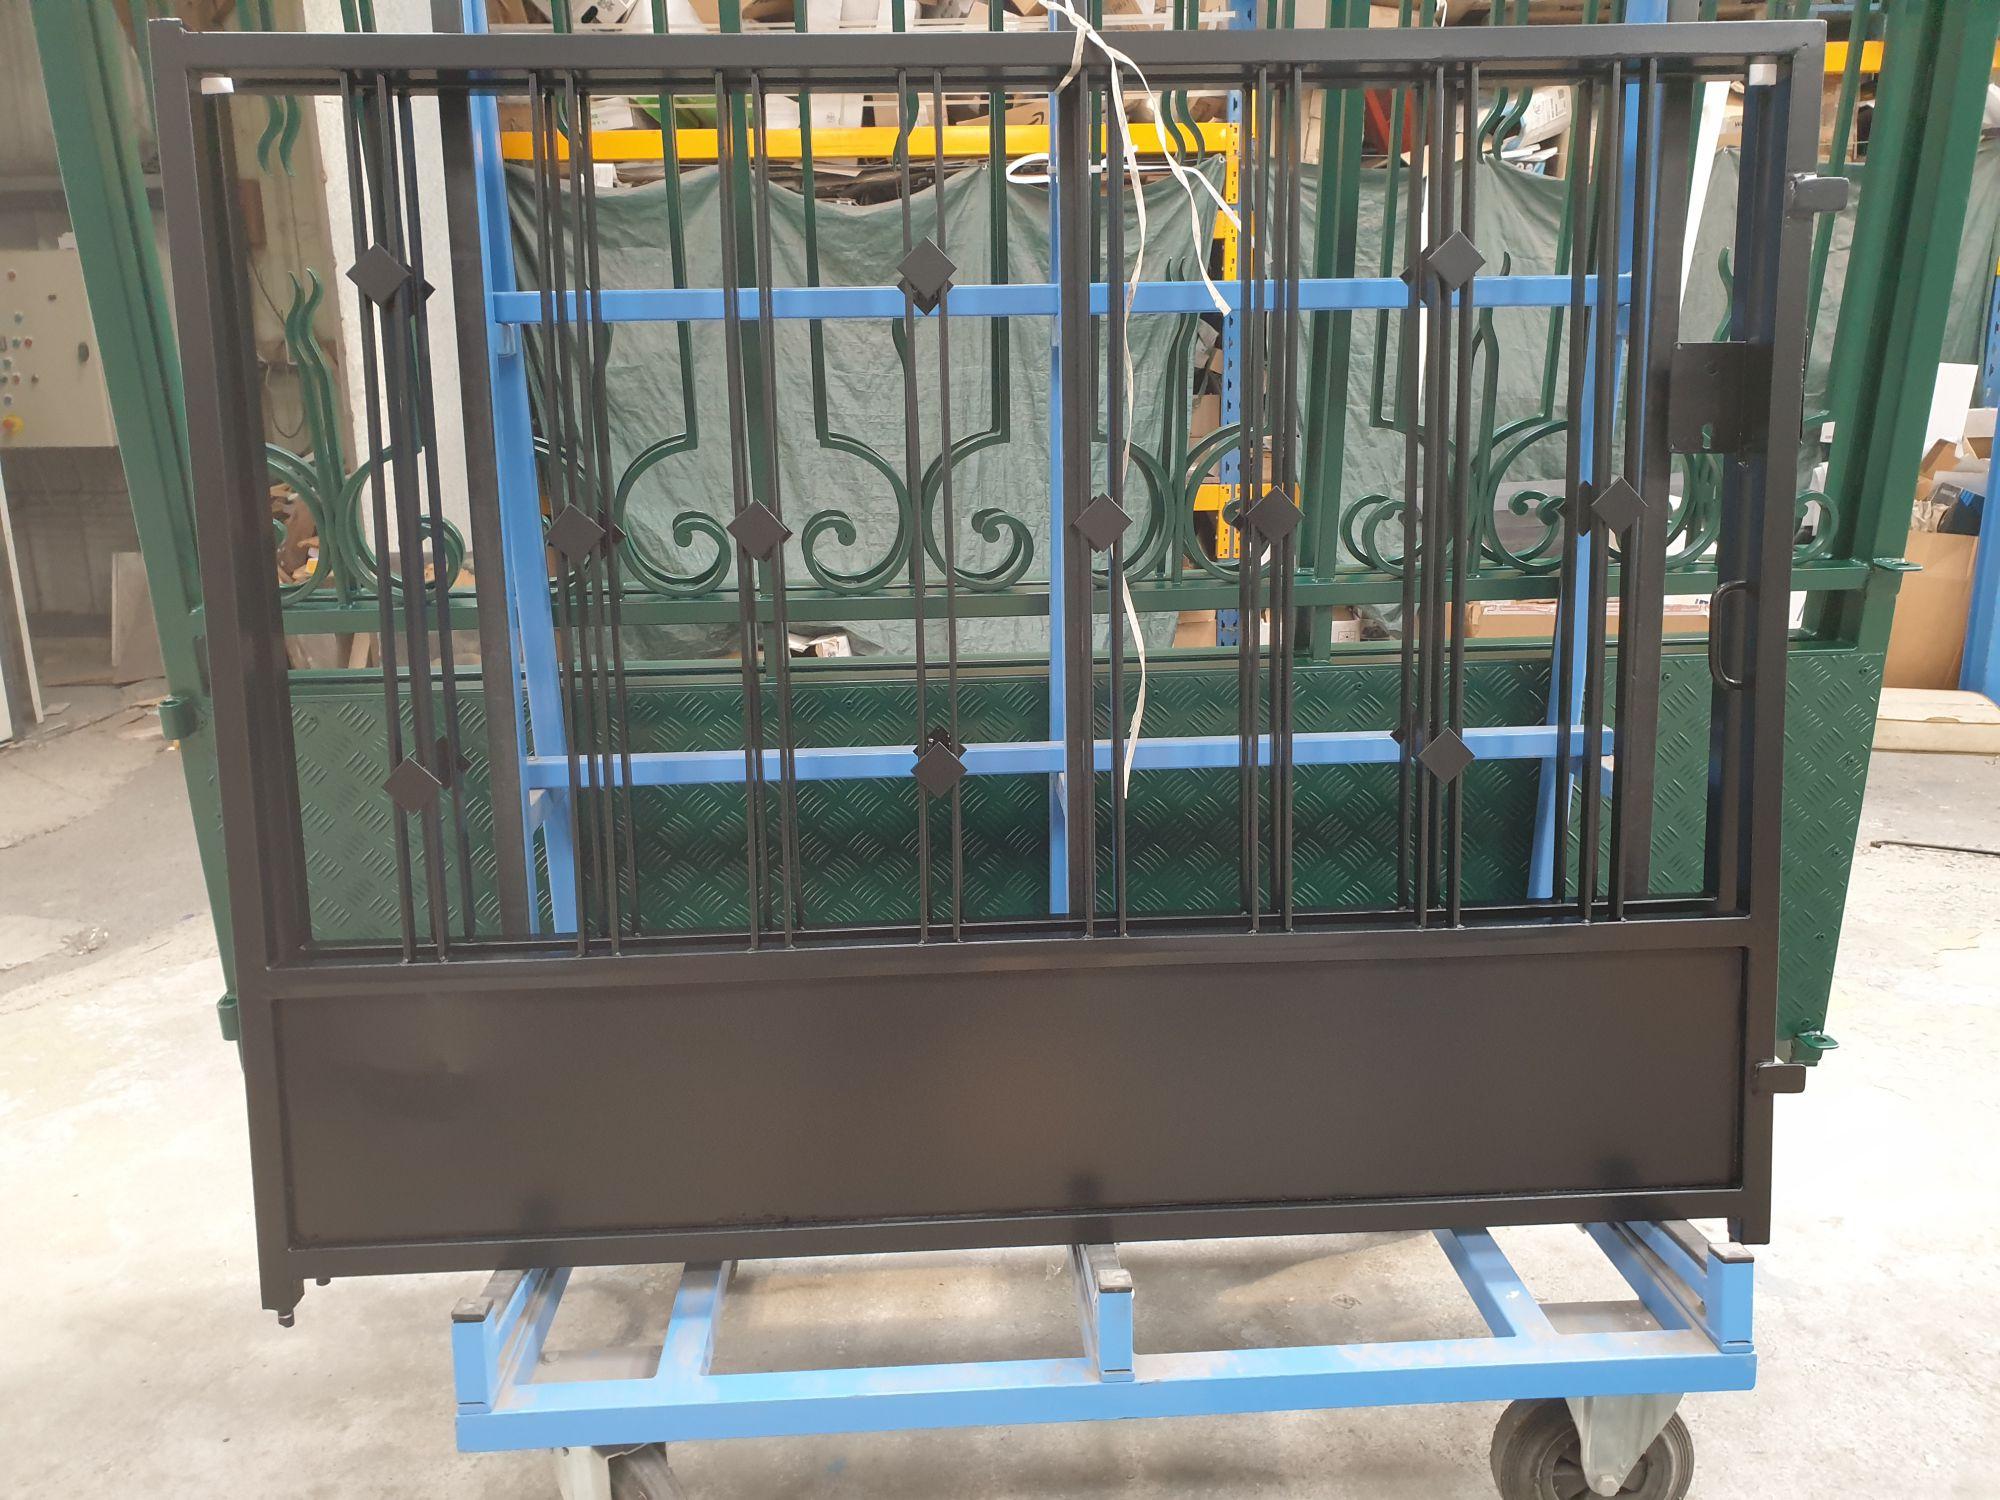 Thermolaquage portail grilles métal 79, 85, 17